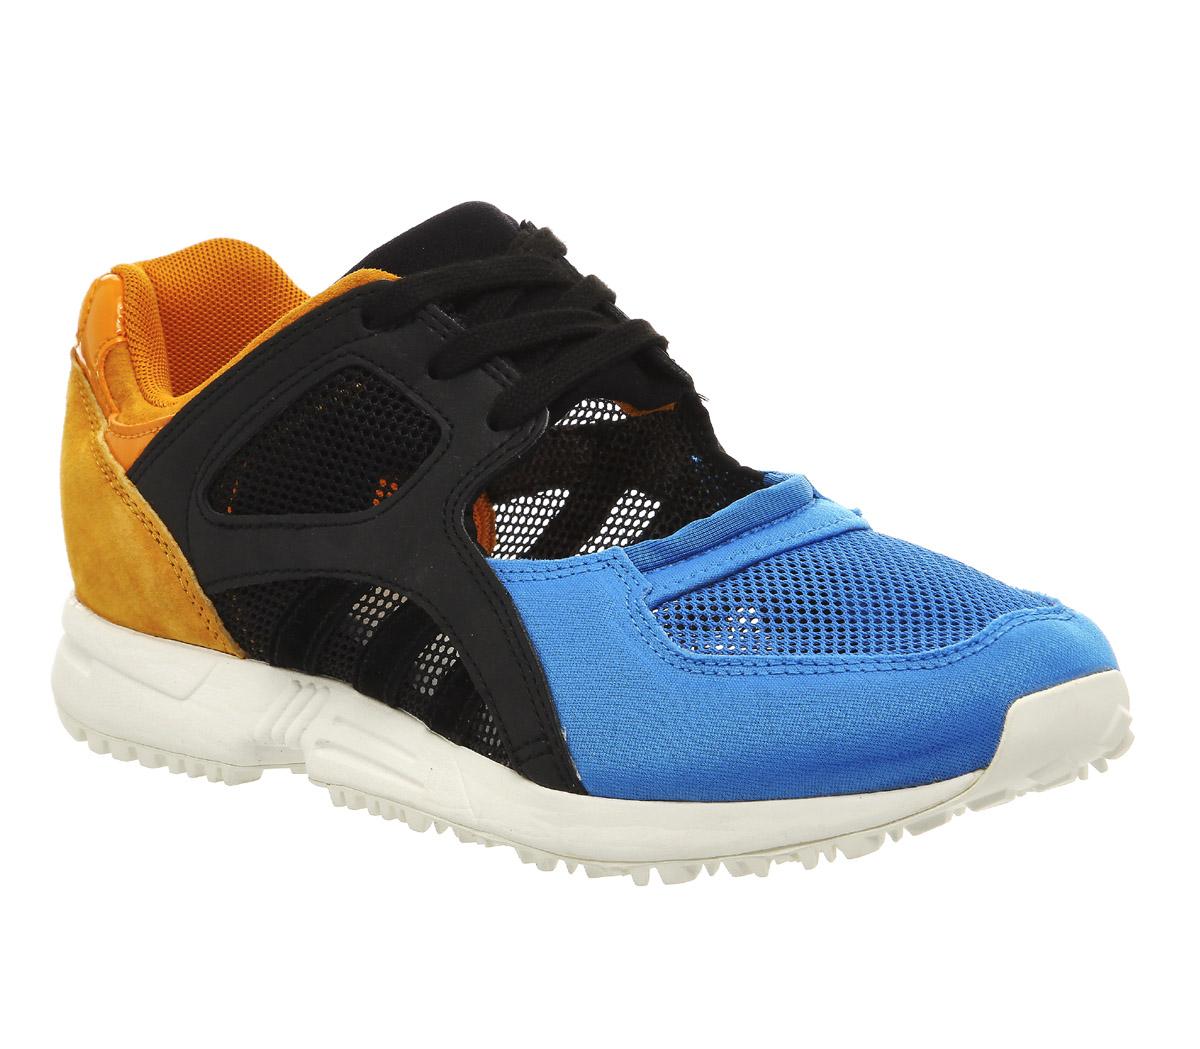 Adidas Eqt Racing Ebay